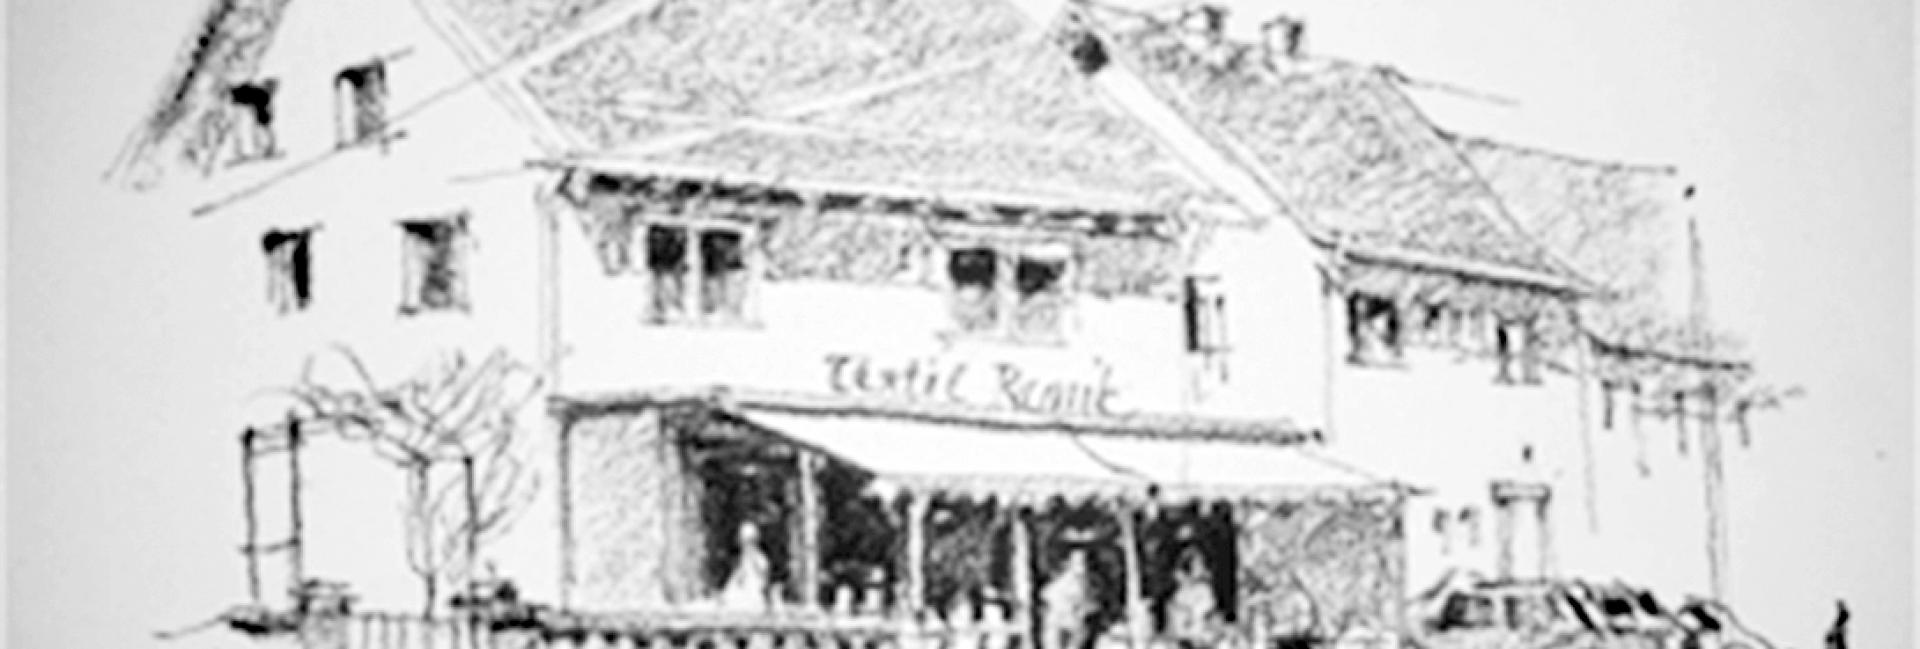 Textil Ramic